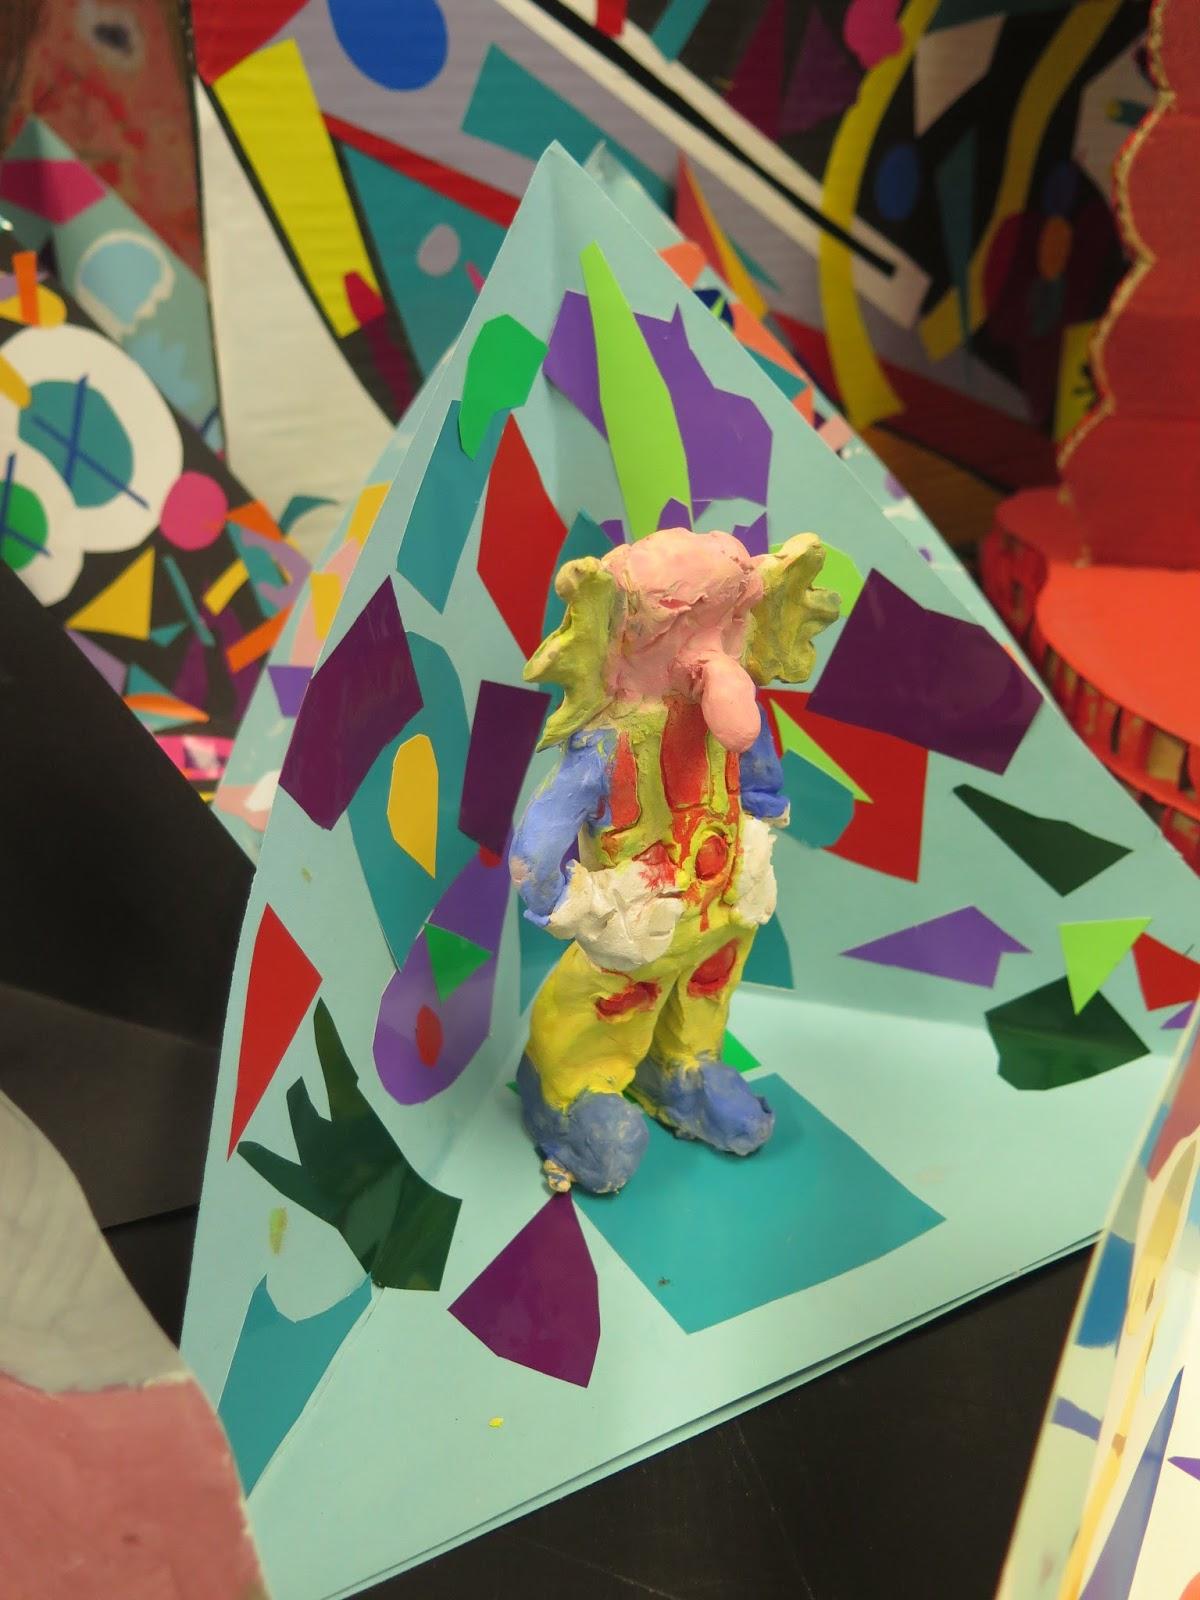 KAWS project | Gomersal Primary School Art